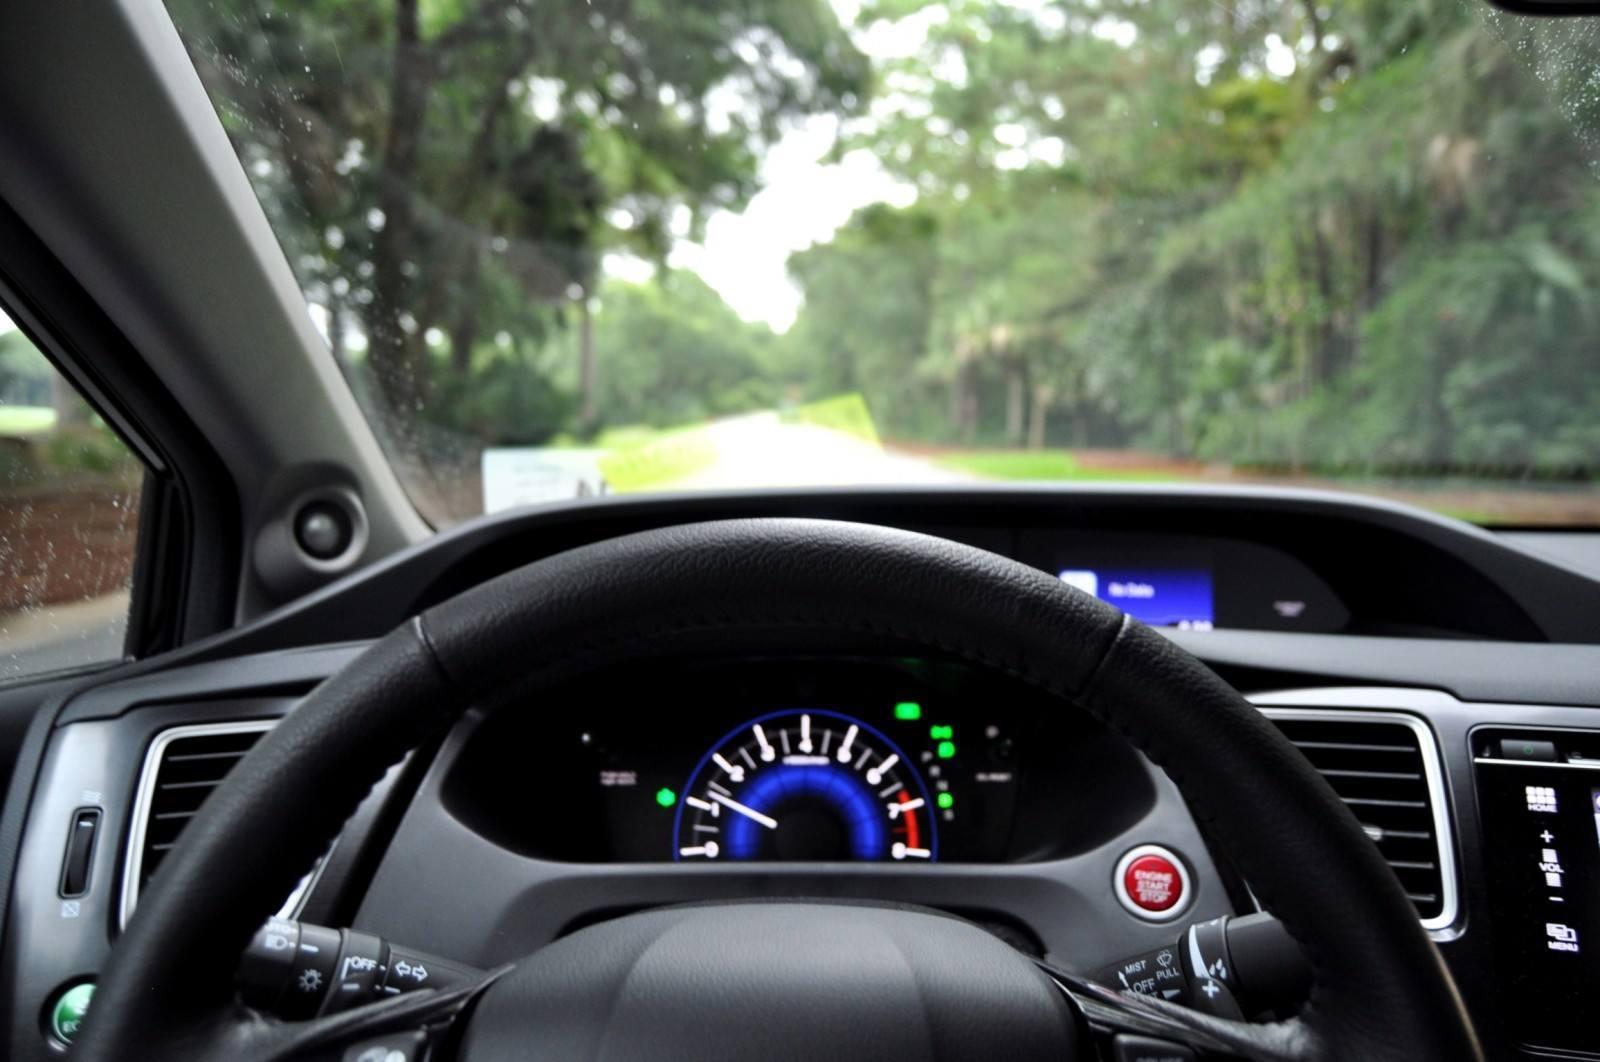 road test review 2014 honda civic ex l coupe 71. Black Bedroom Furniture Sets. Home Design Ideas